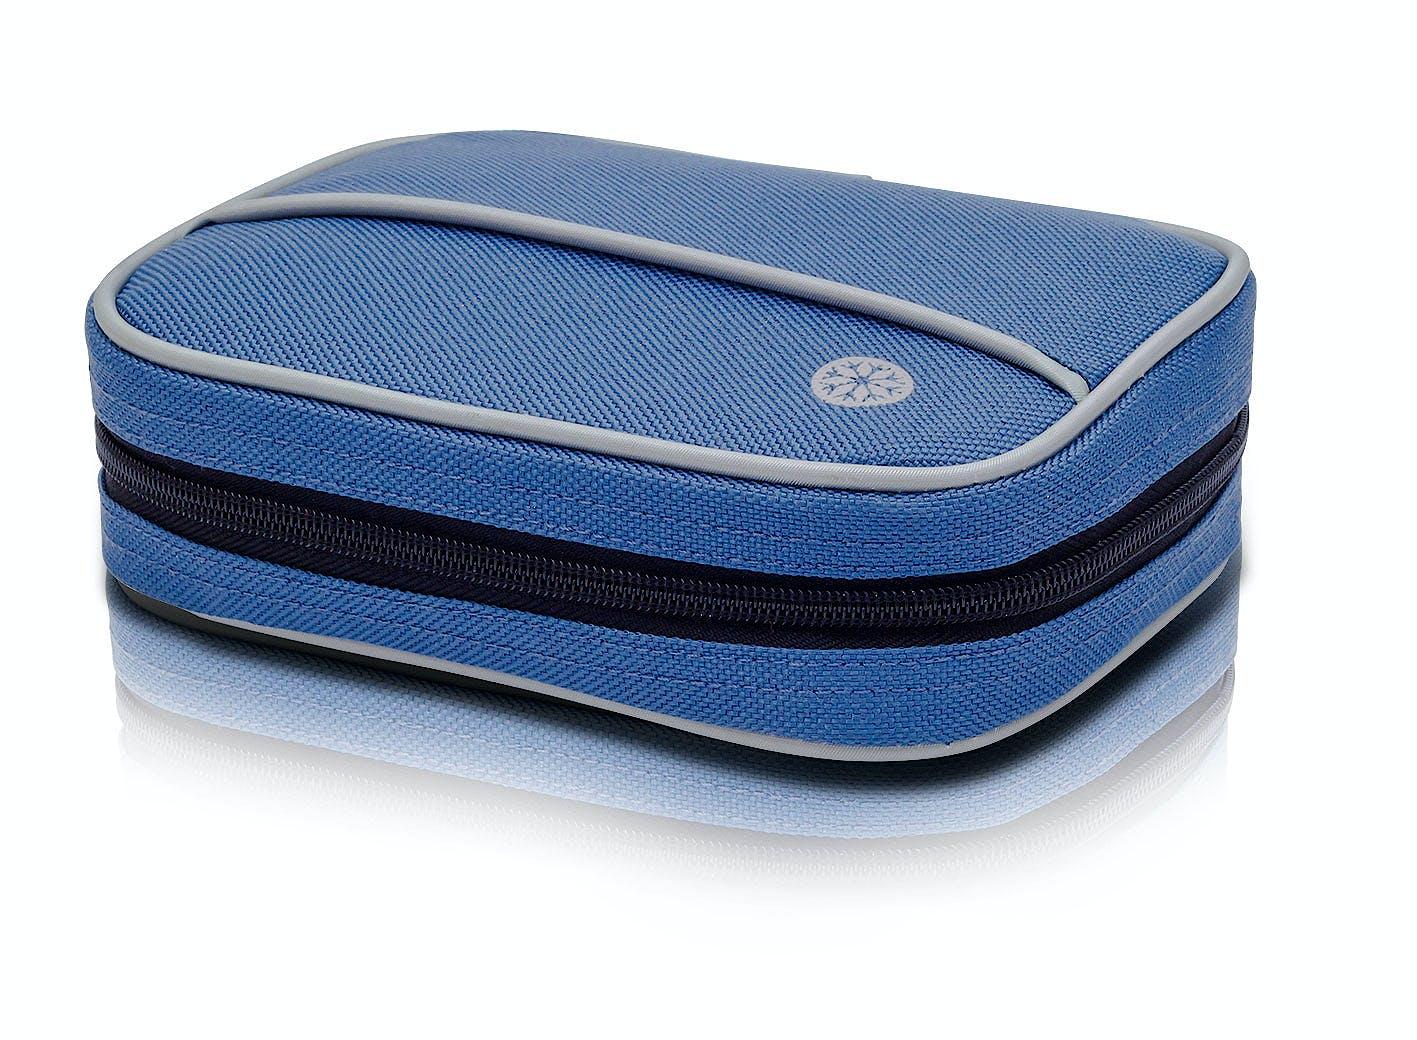 Bolsa Deportiva Sanitaria de Poliéster Azul Modelo MEDIC'S EB06.005